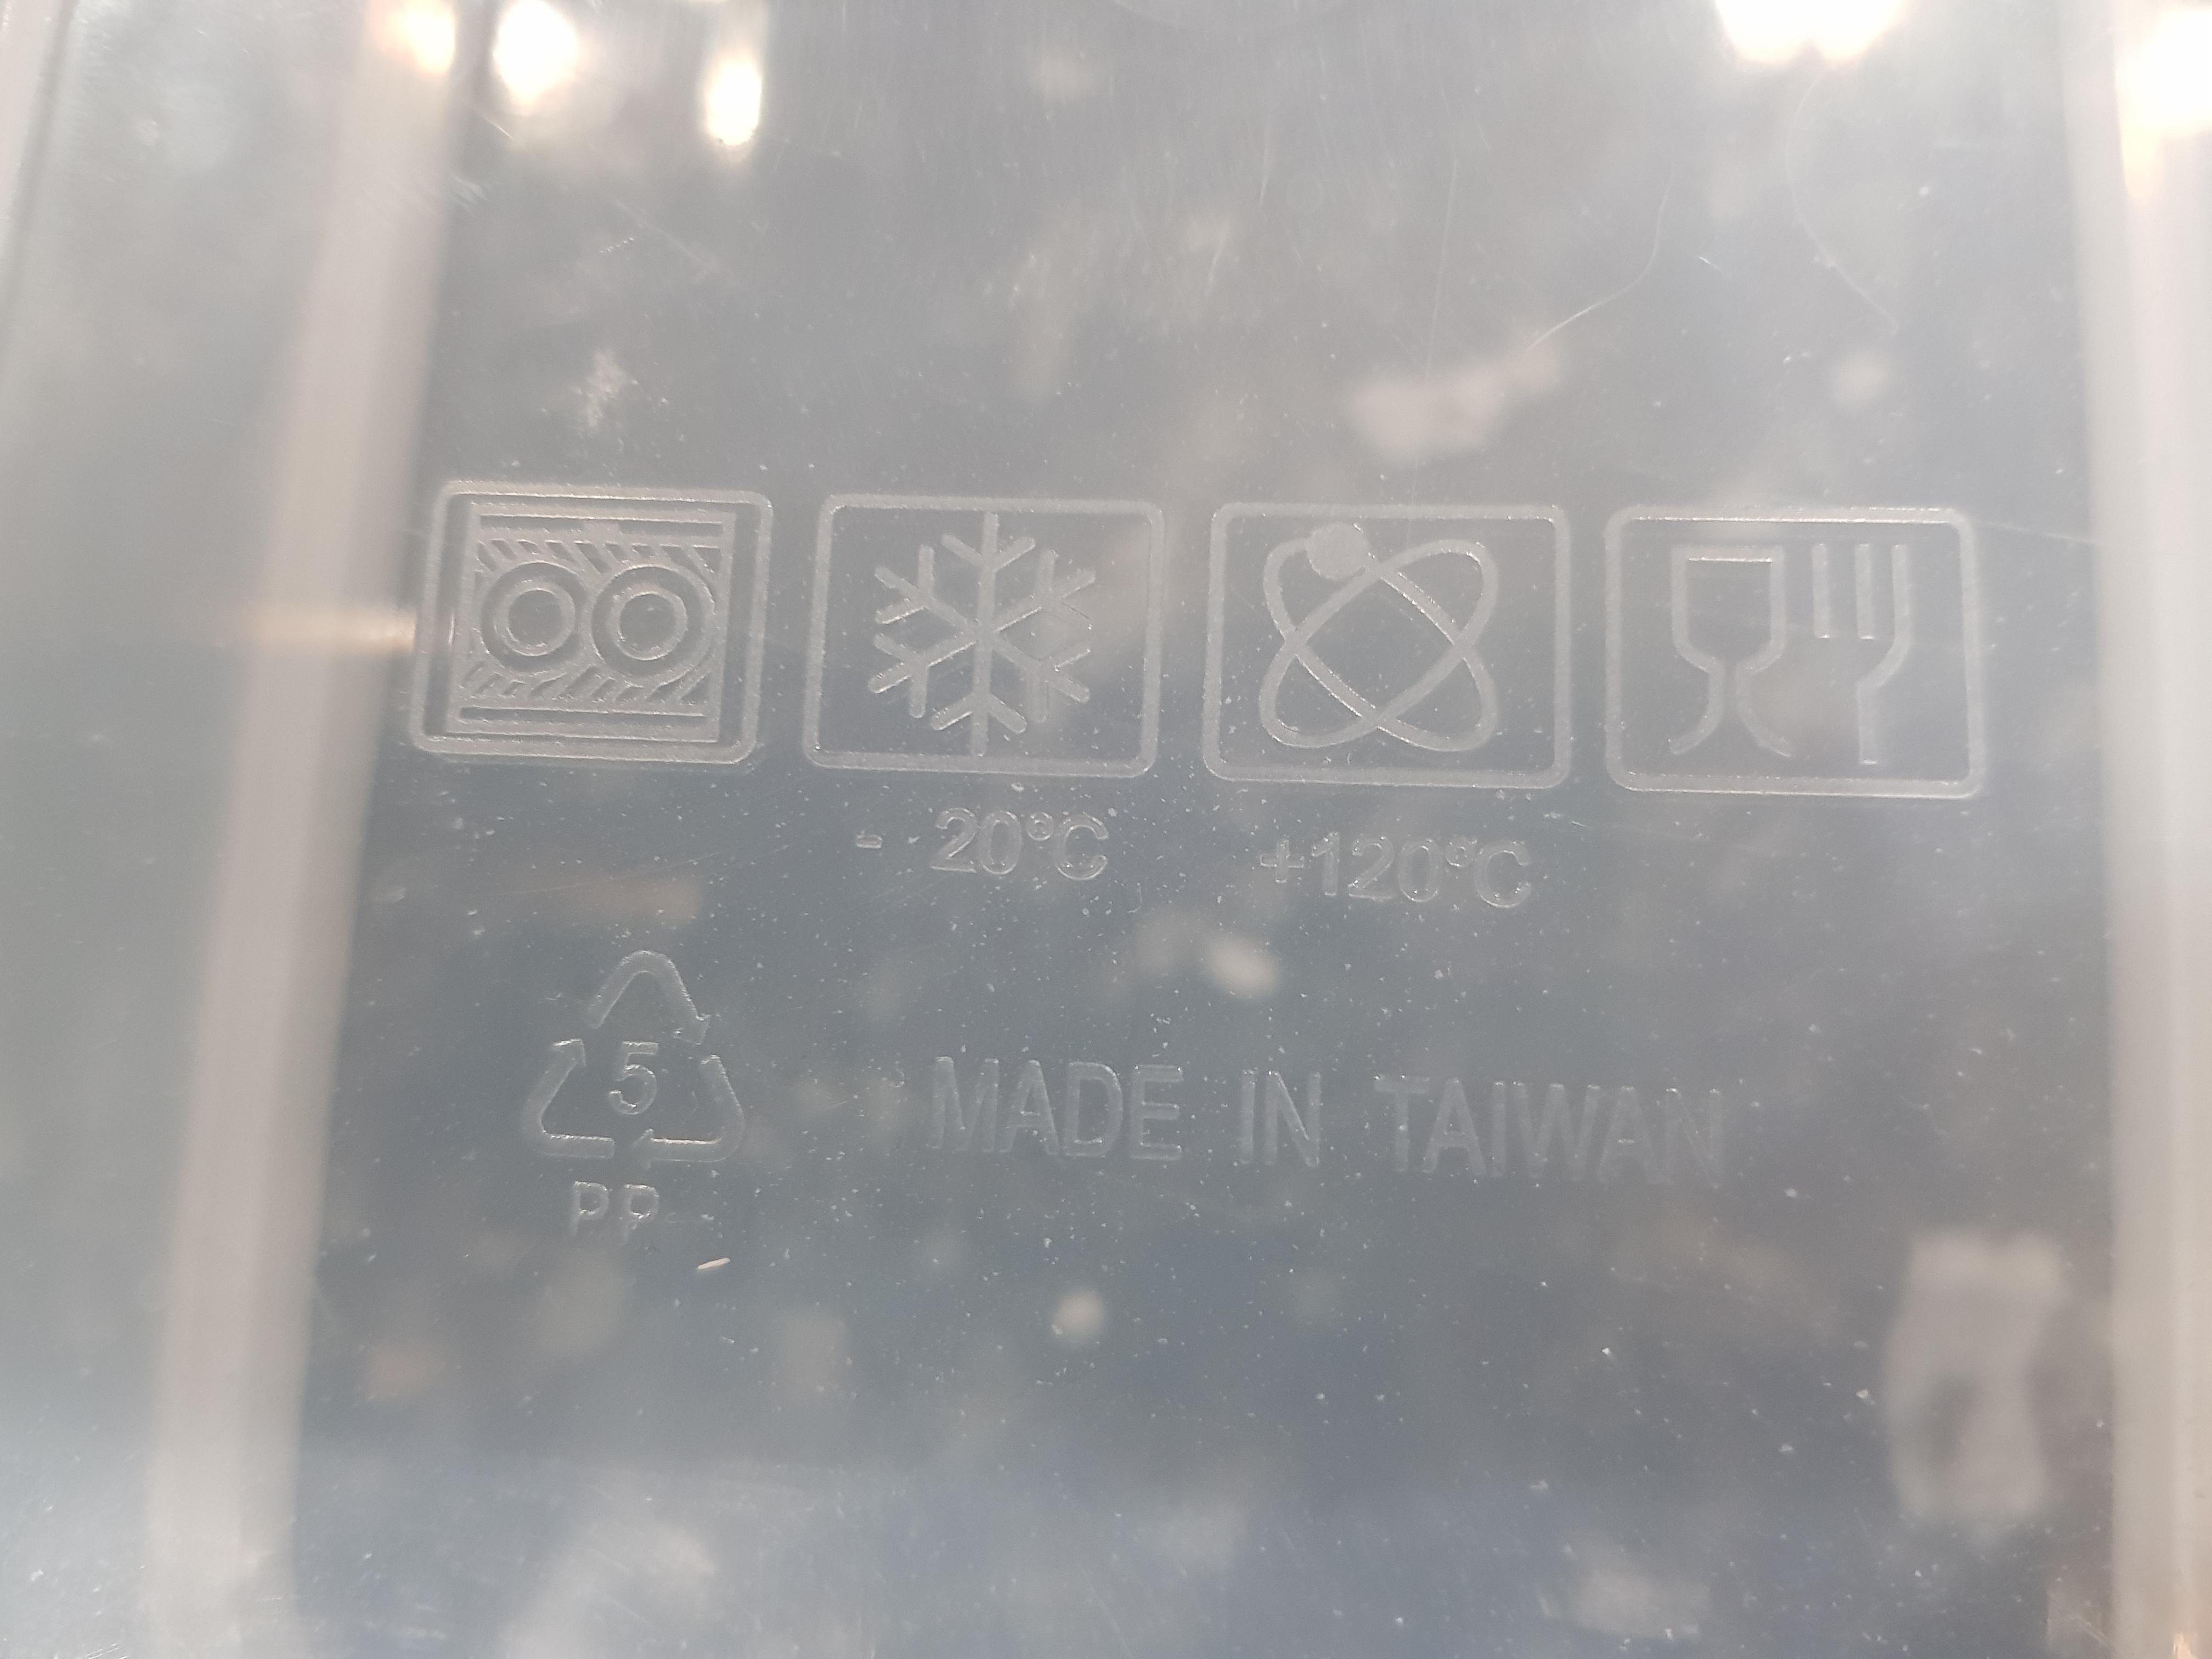 what s the atom symbol on this plastic